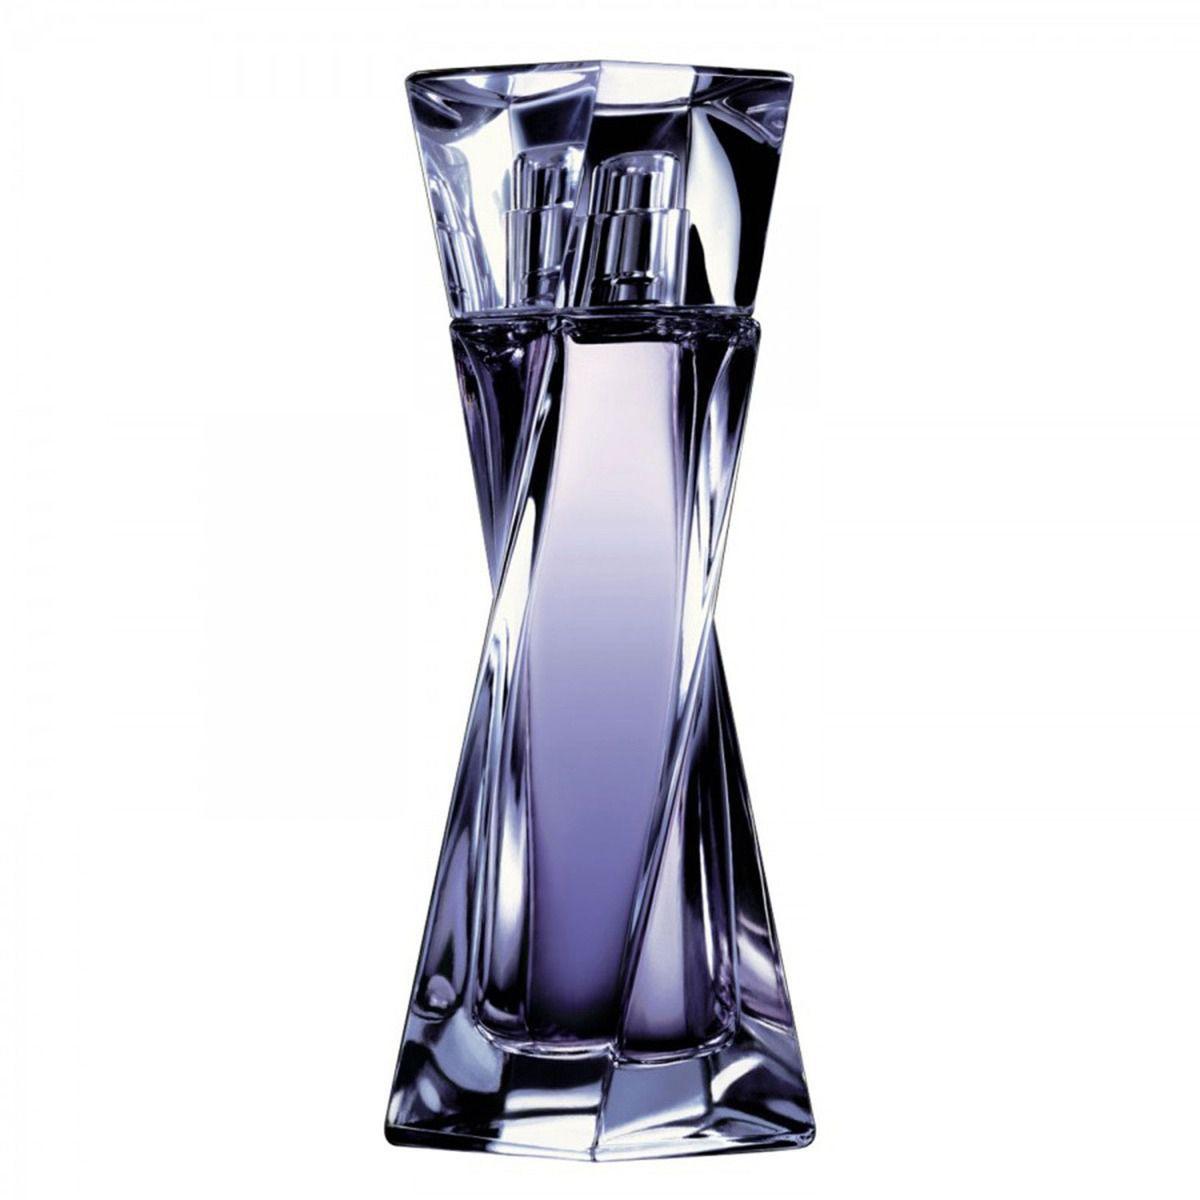 Perfume LANCOME HYPNÔSE FEMININO EAU DE PARFUM